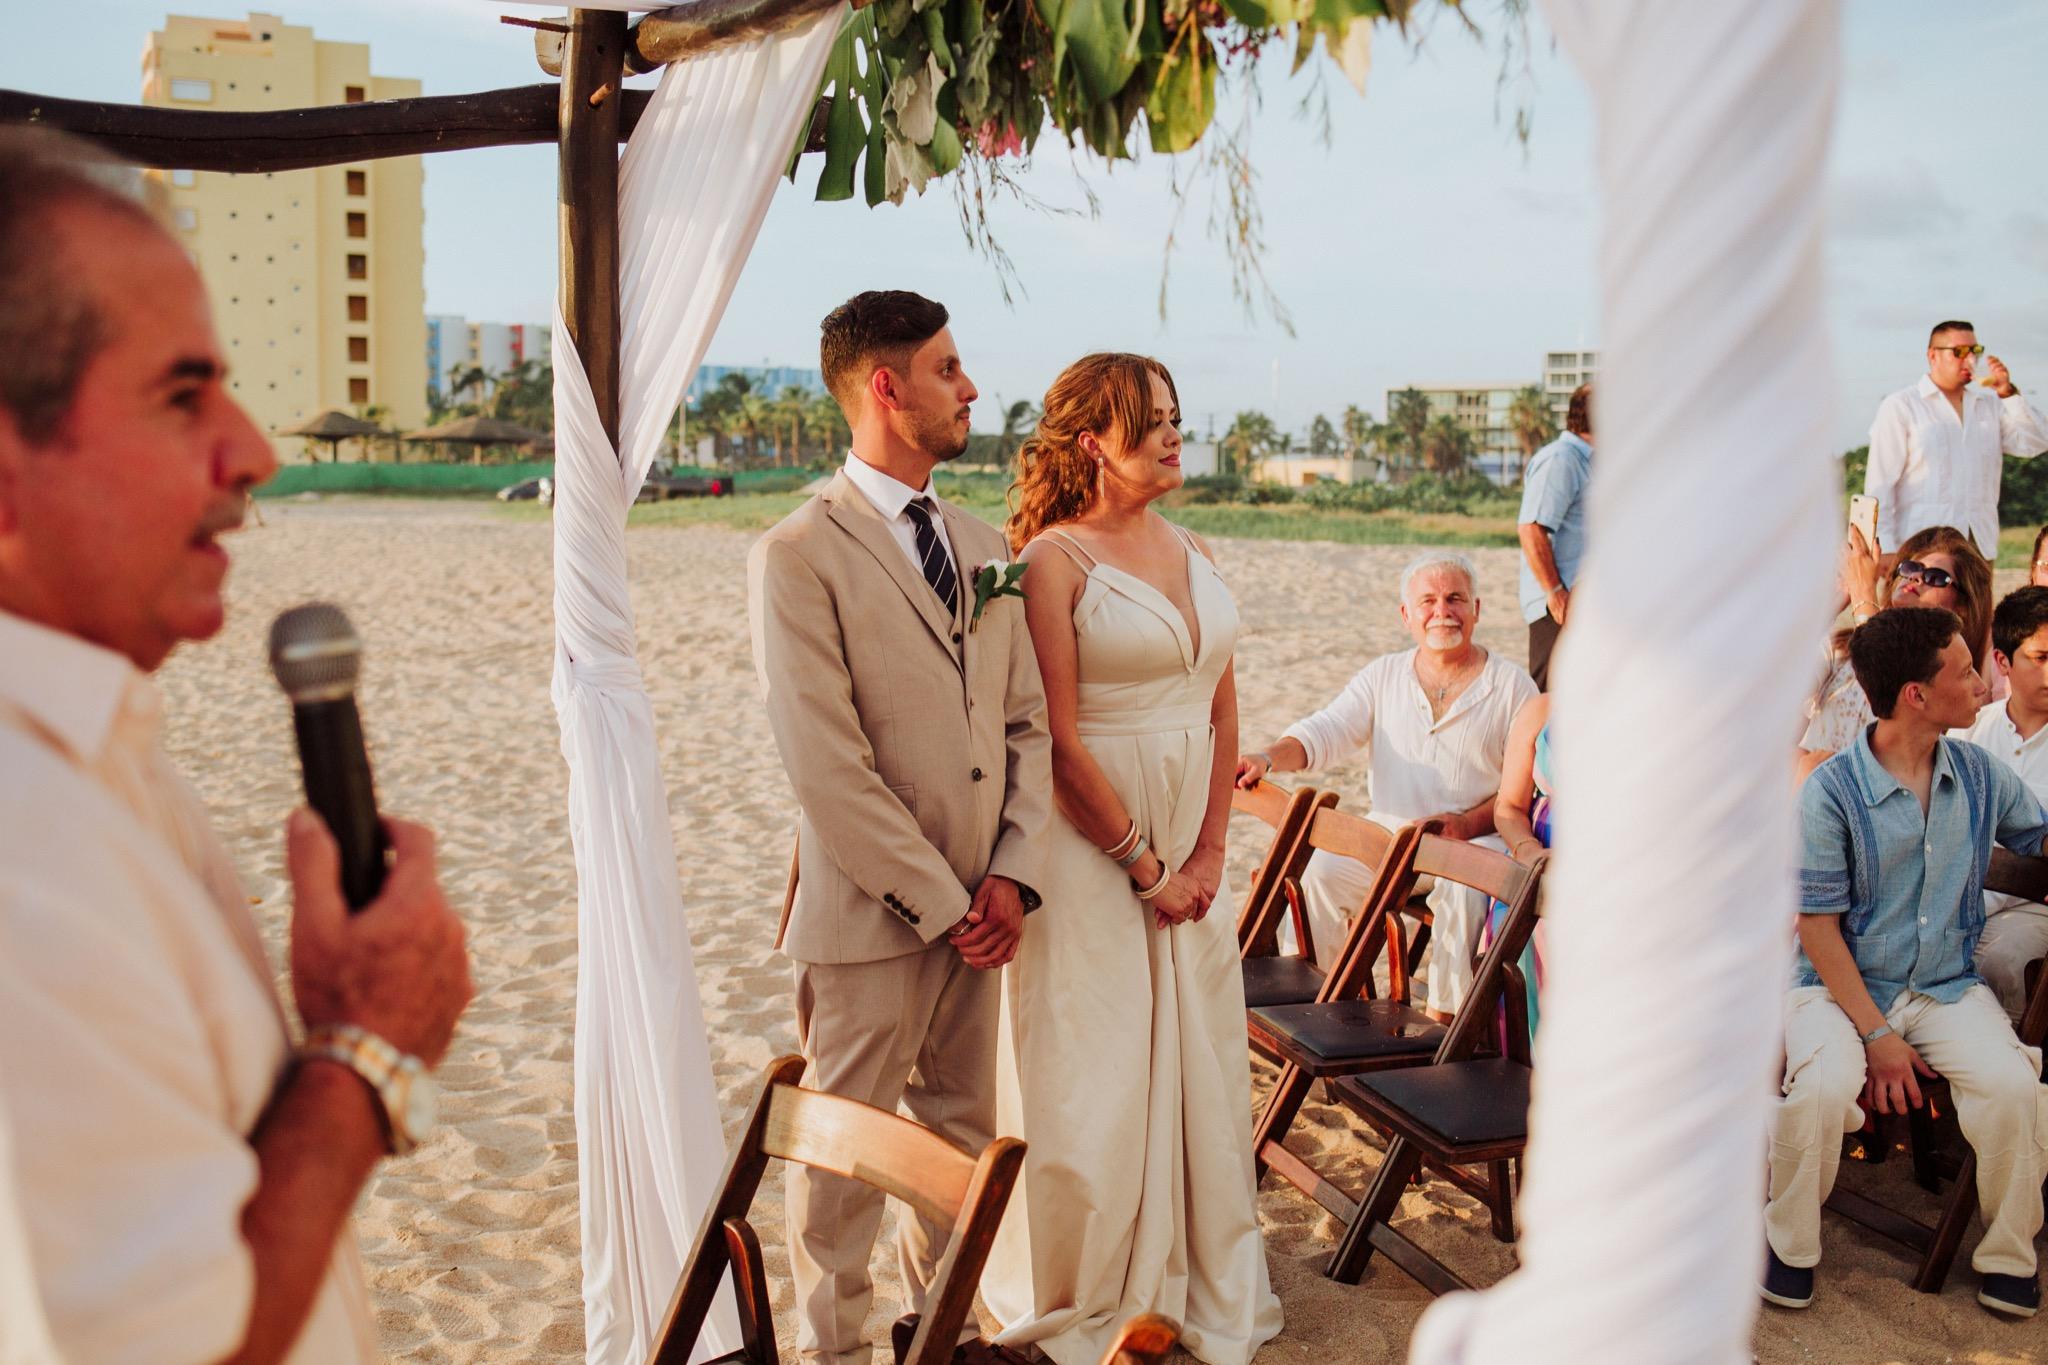 Javier_noriega_fotografo_bodas_profesional_zacatecas_mexico_mazatlan_sinaloa_photographer_weddings54